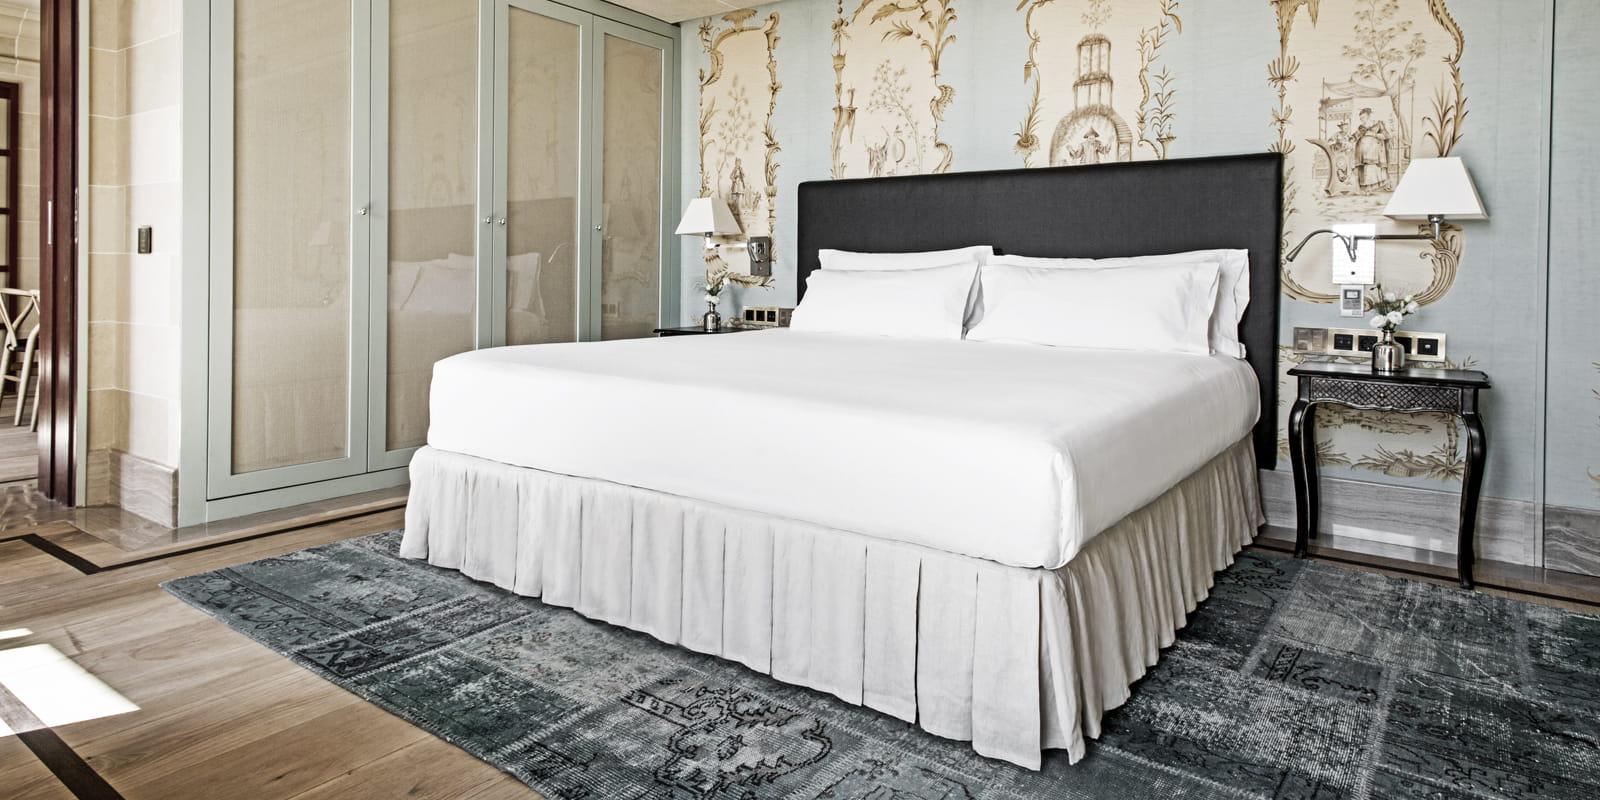 OCOA-HOTEL-MAJESTIC-BARCELONA-9